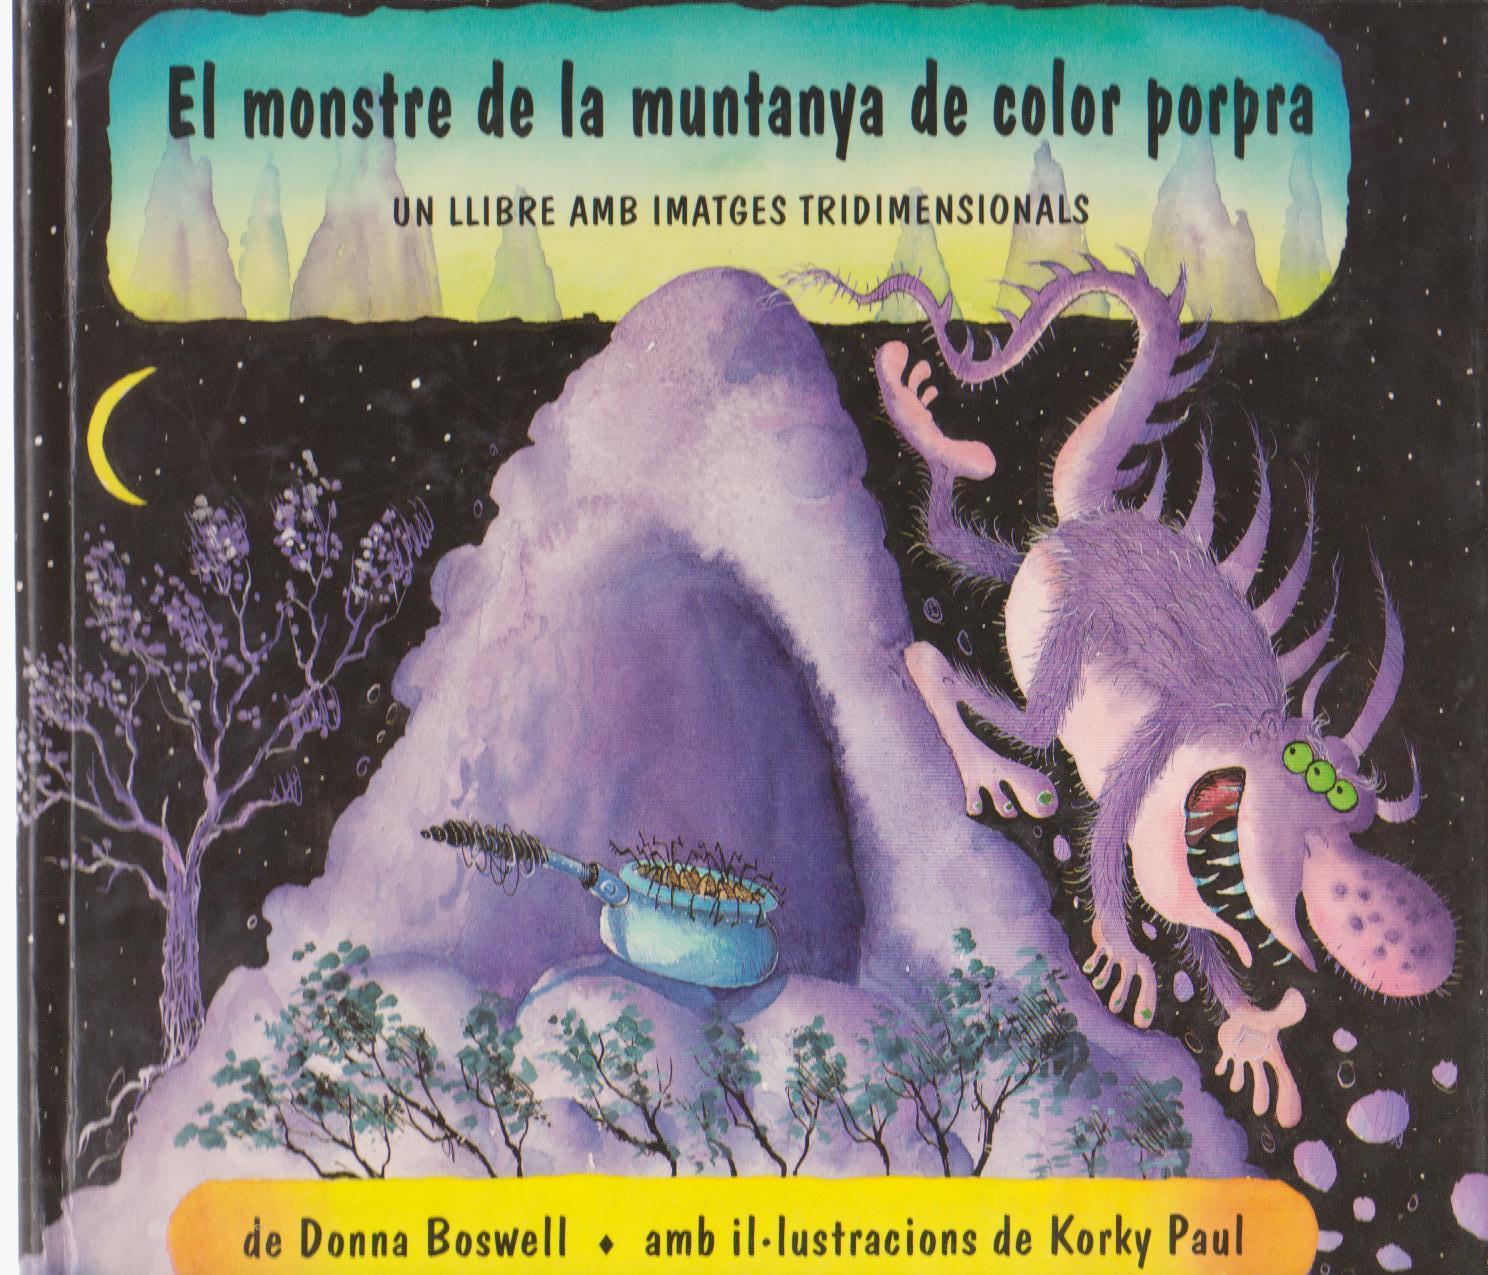 El monstre de la muntanya de color porpra